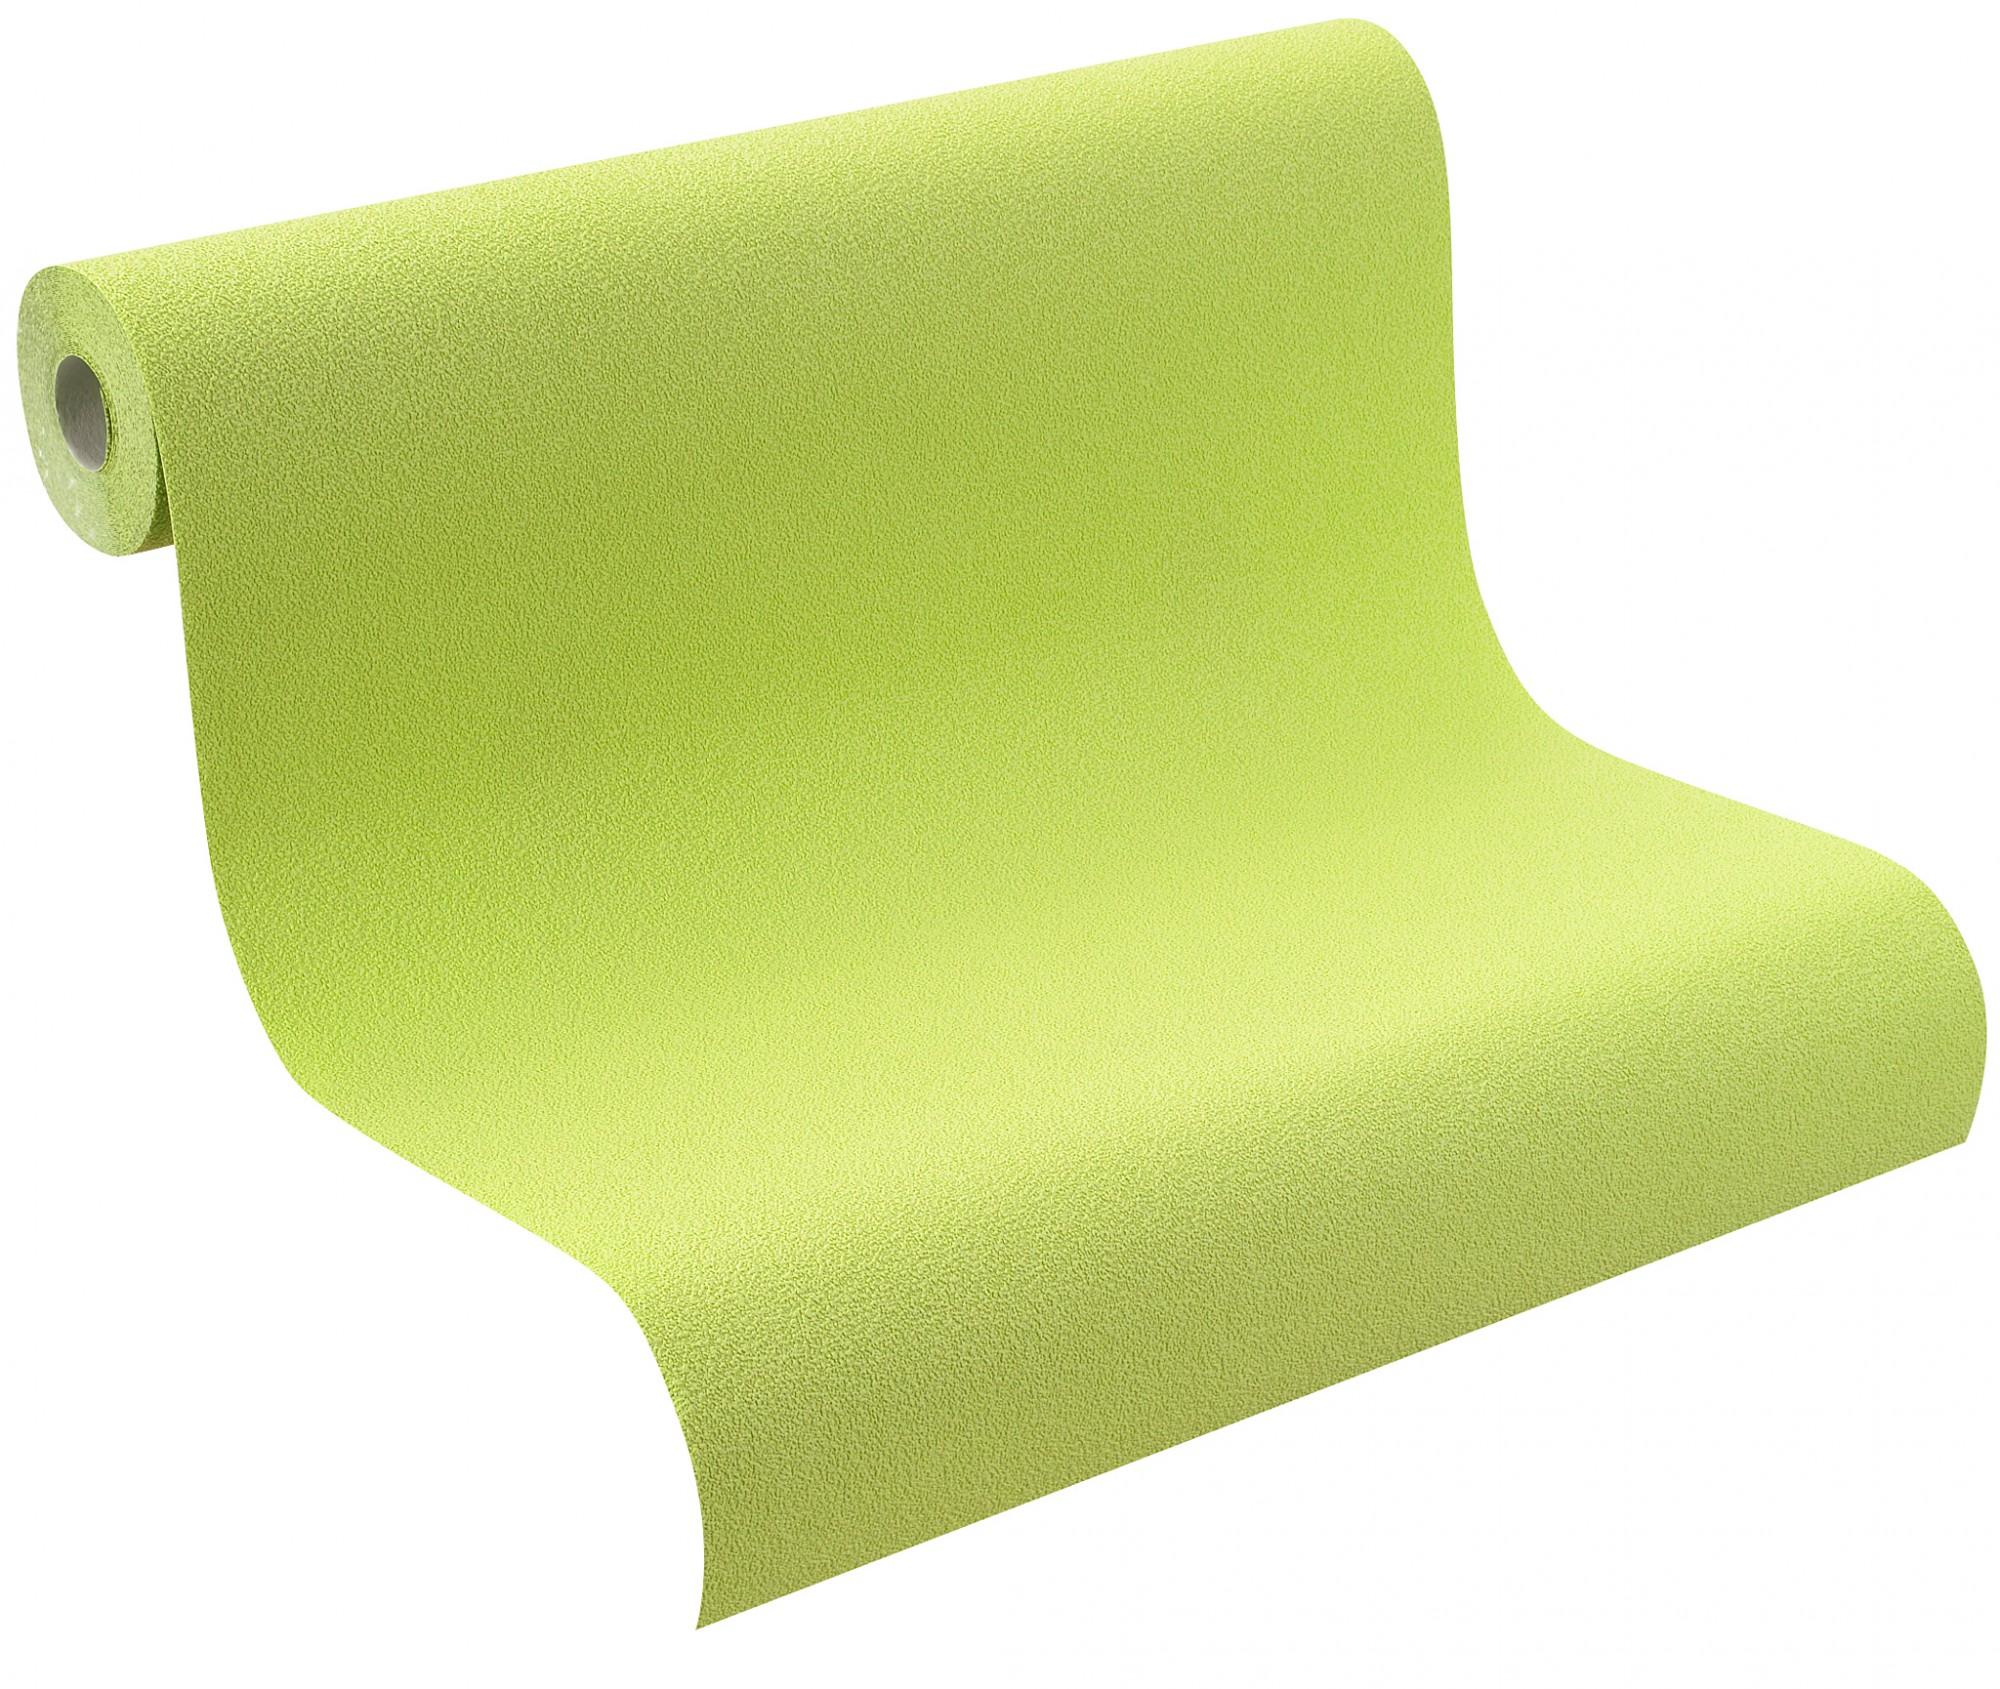 tapete rasch prego tapete 469035 vliestapete uni gr n ebay. Black Bedroom Furniture Sets. Home Design Ideas